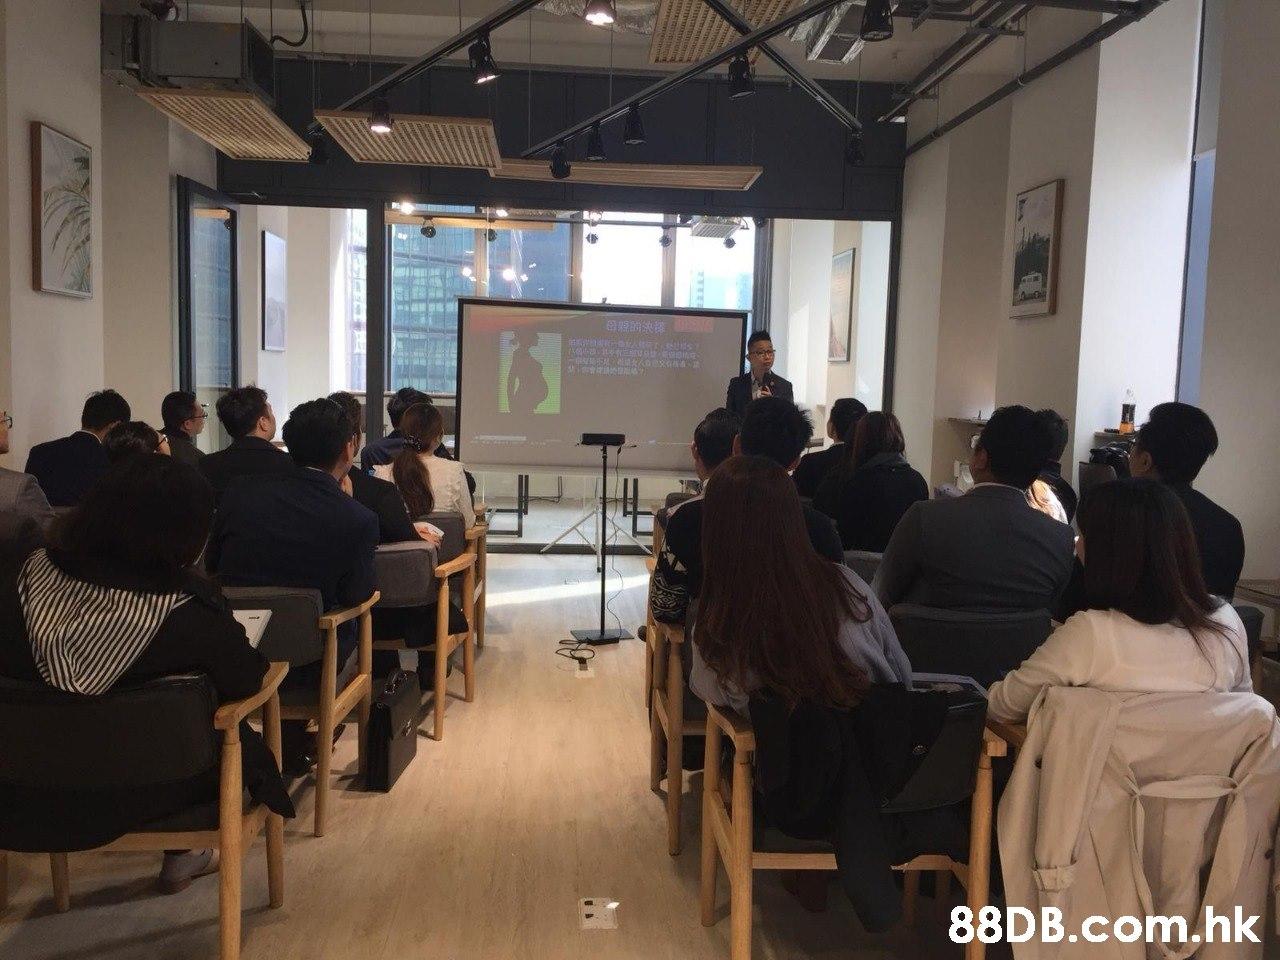 w.CRARGeRGa .hk,Event,Room,Seminar,Building,